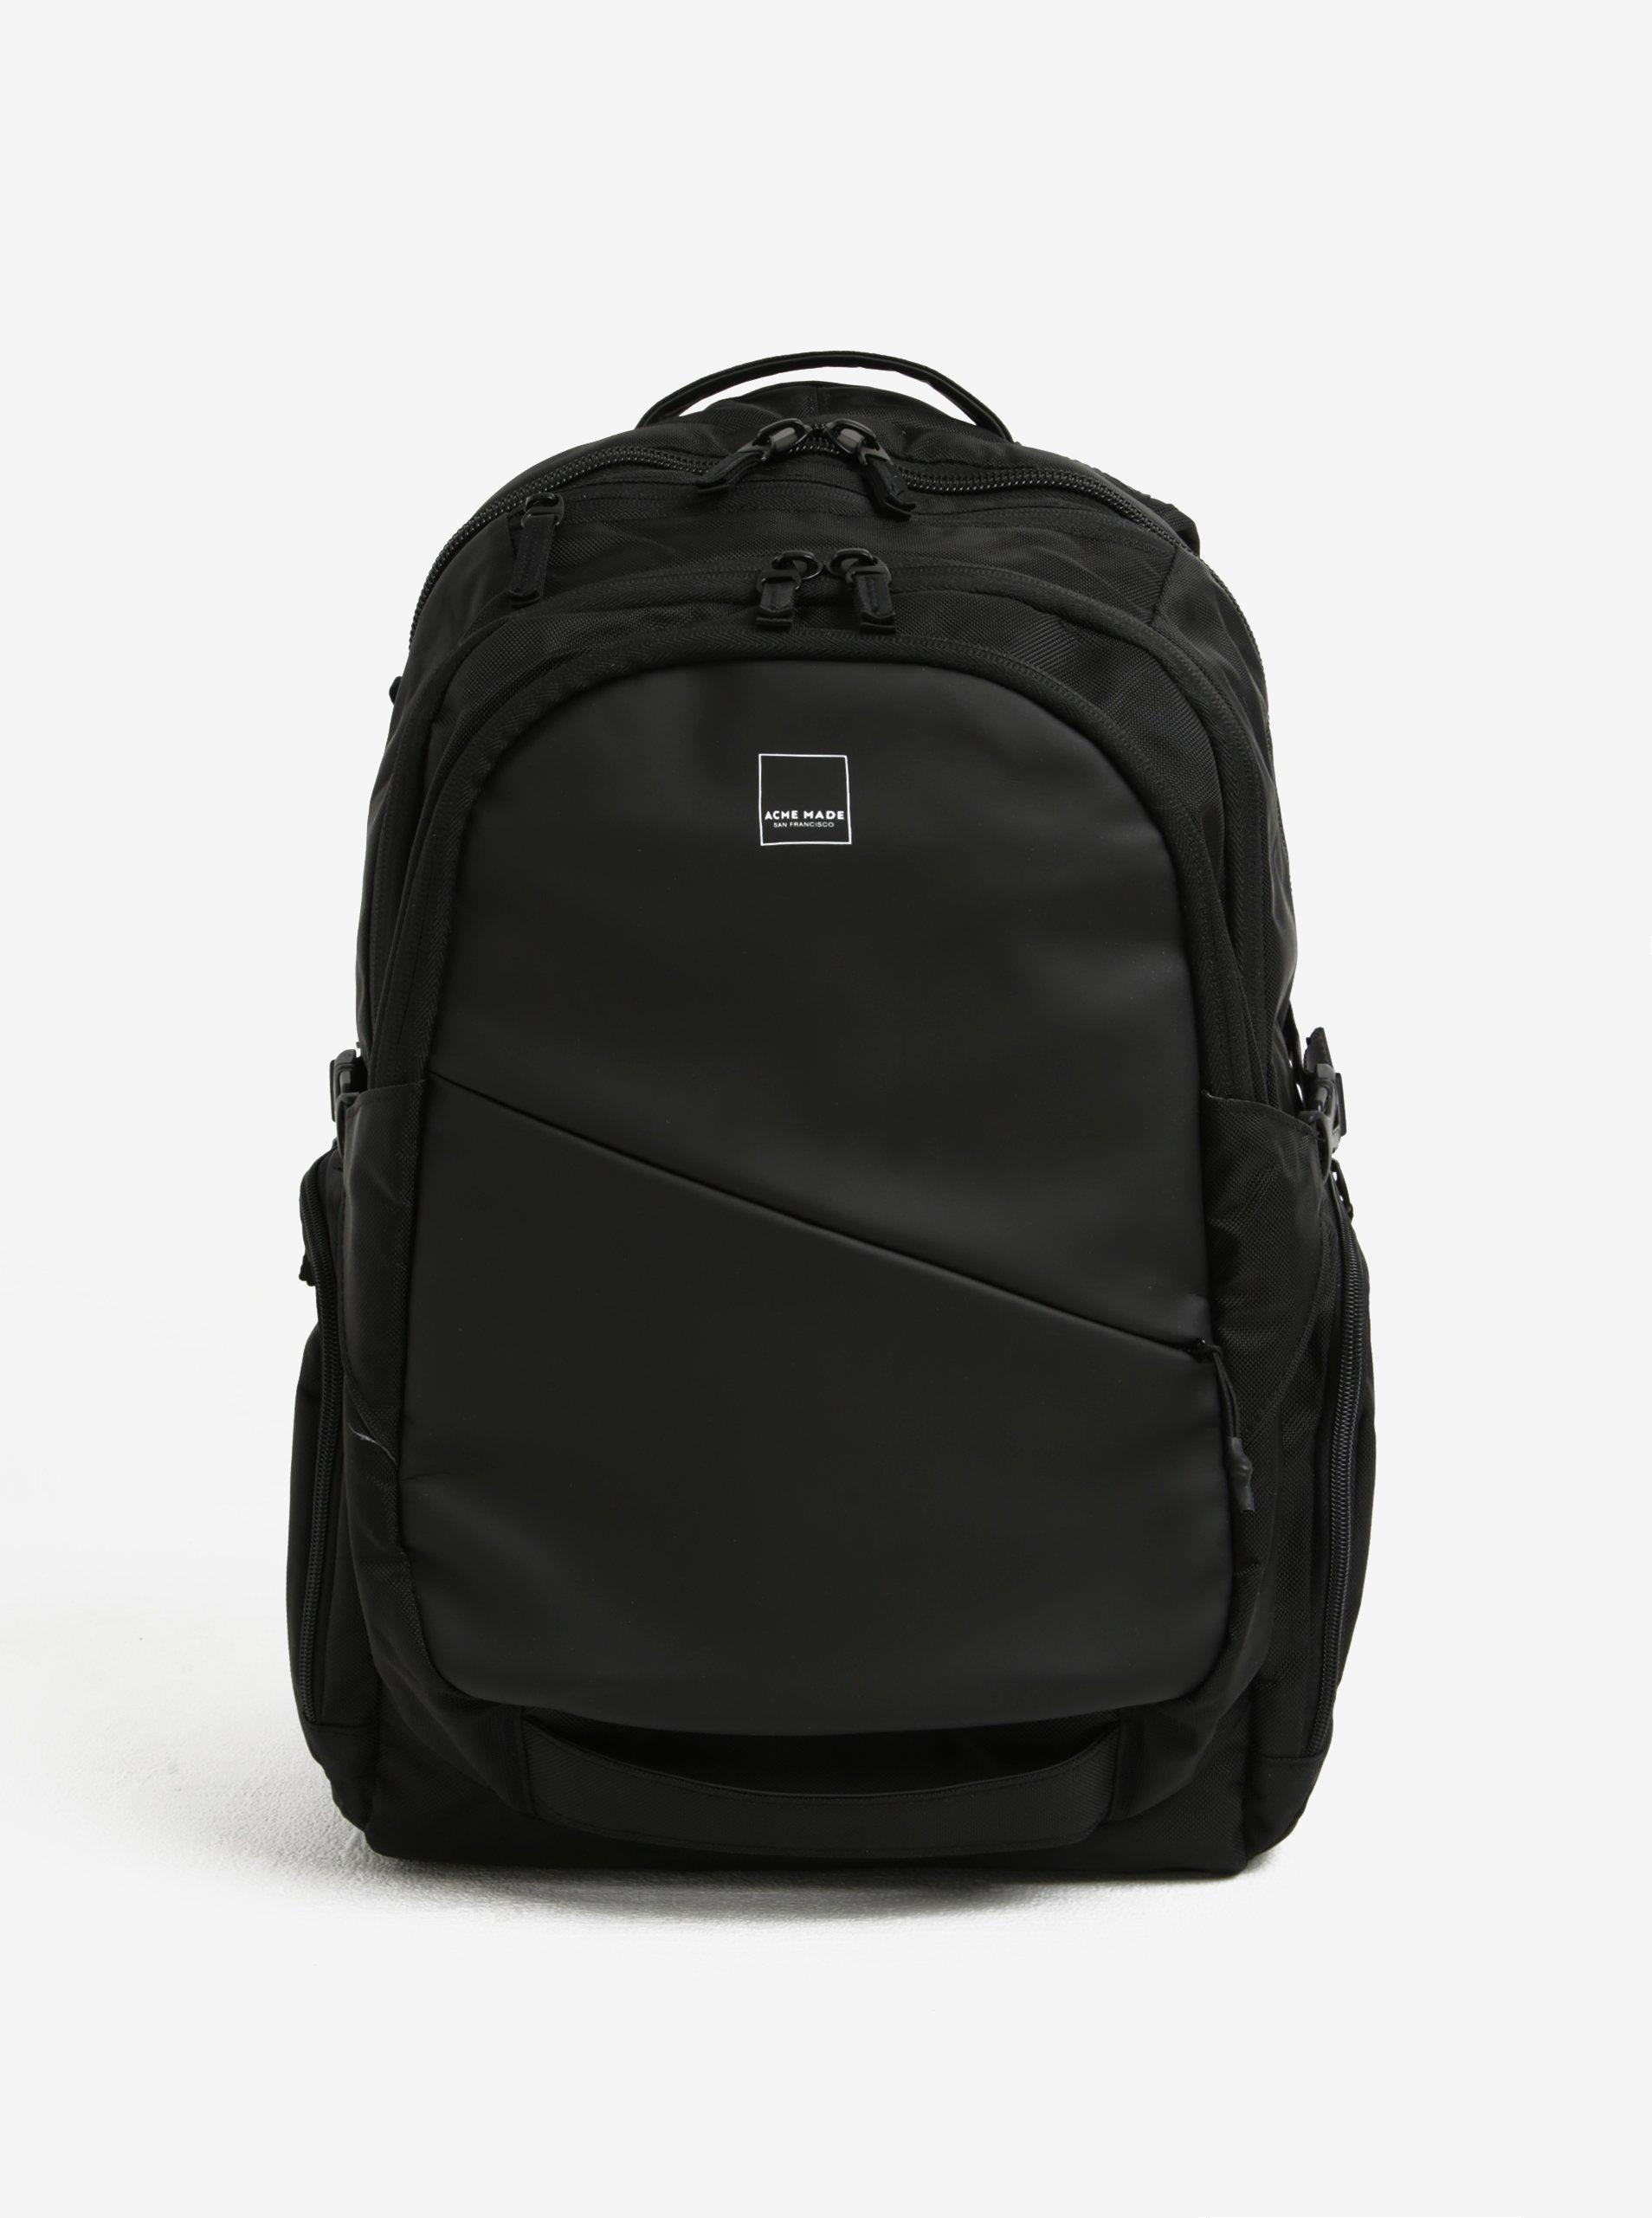 Černý batoh Acme Made Union Street Traveler Backpack 28 l